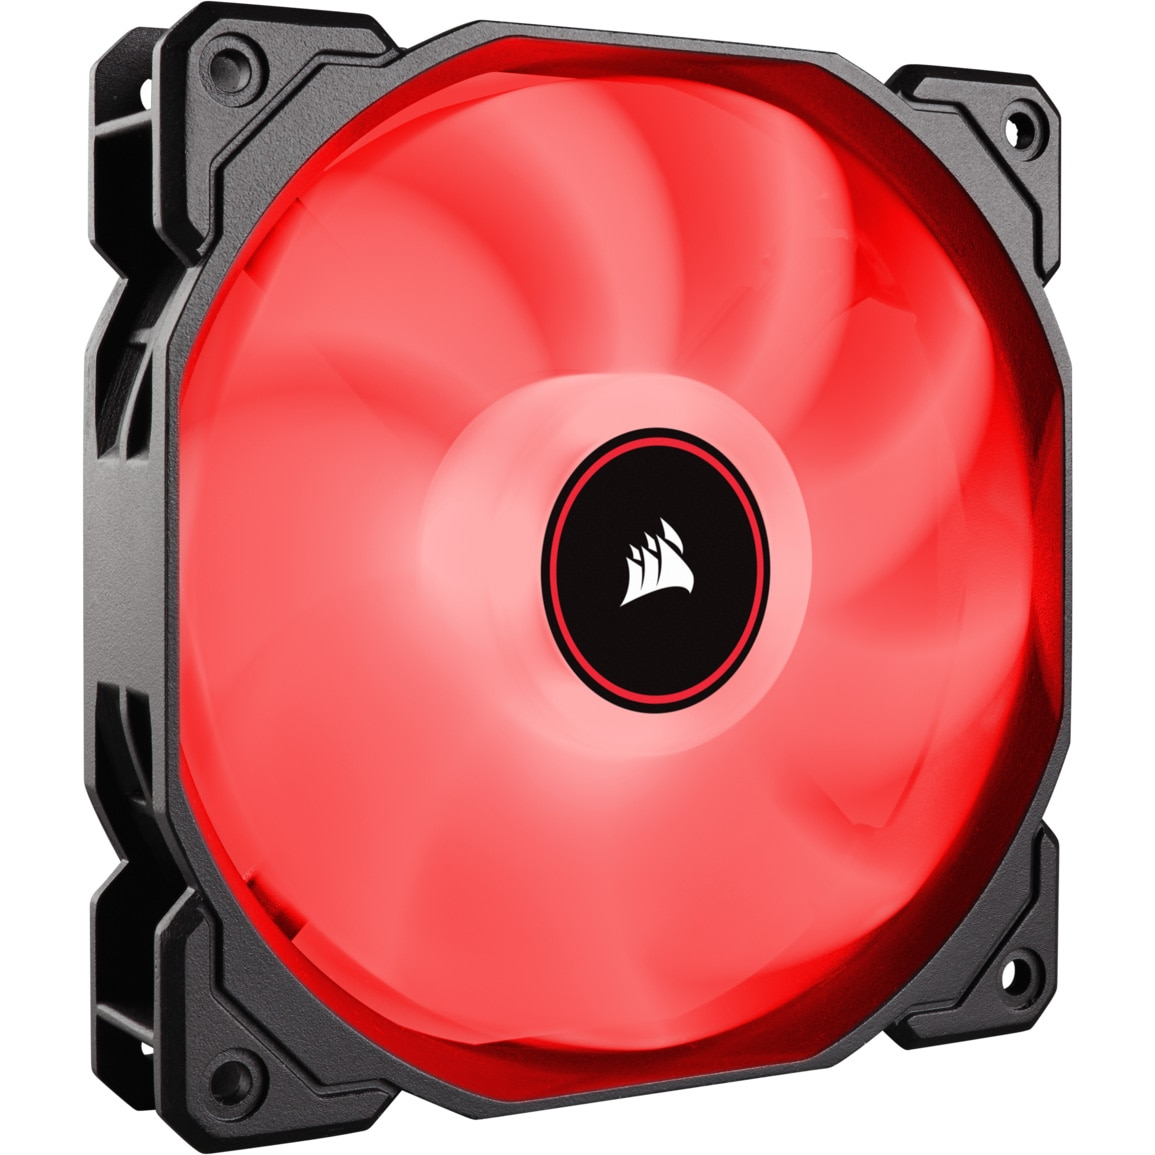 Fotografie Ventilator PC Corsair AF140 LED Low Noise Cooling Fan, 1200 RPM, Single Pack - Red